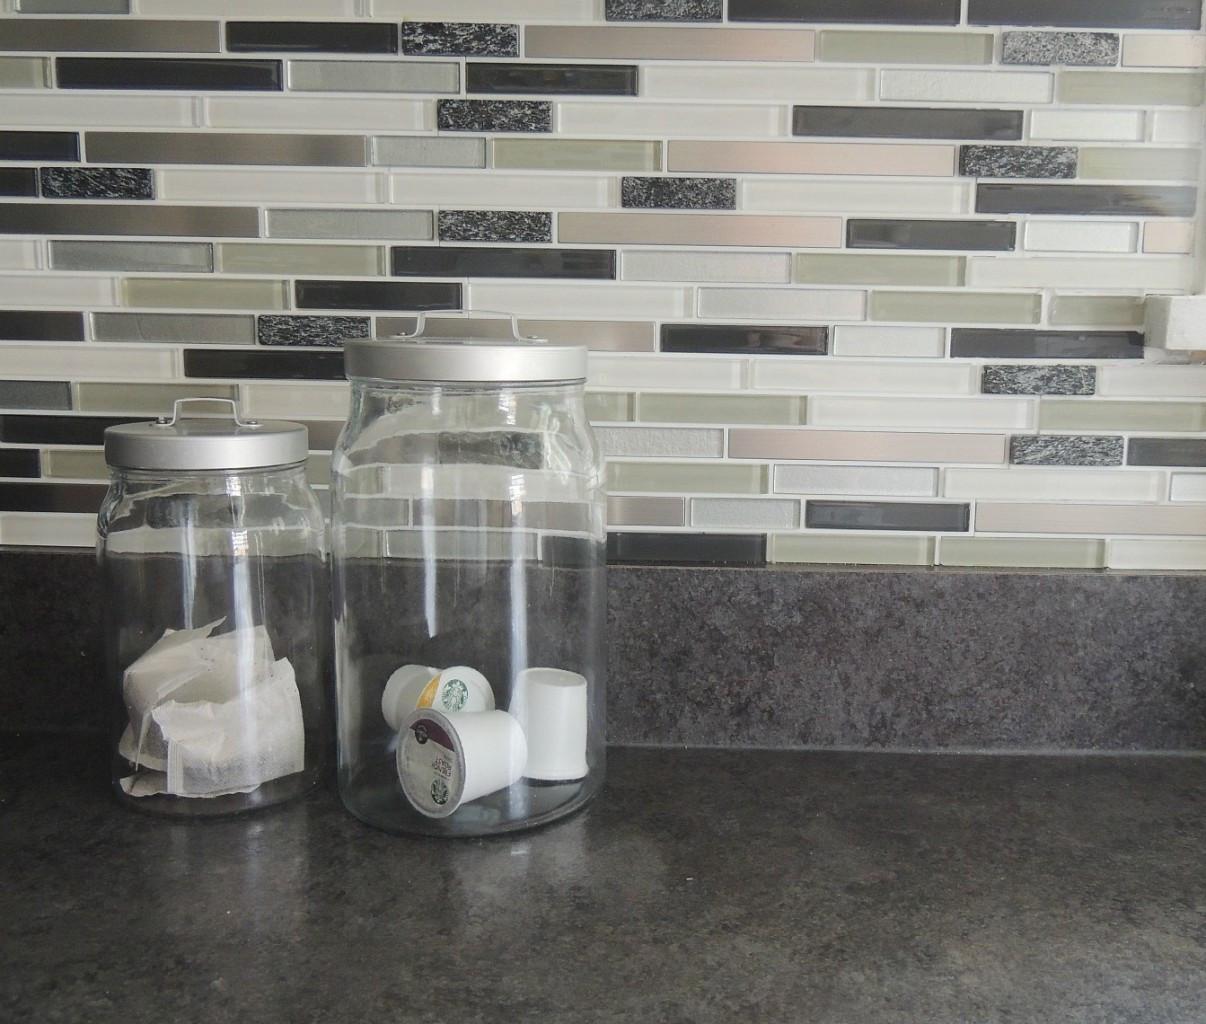 Kitchen Peel And Stick Backsplash  Kitchen Your Kitchen Look Awesome By Using Peel And Stick